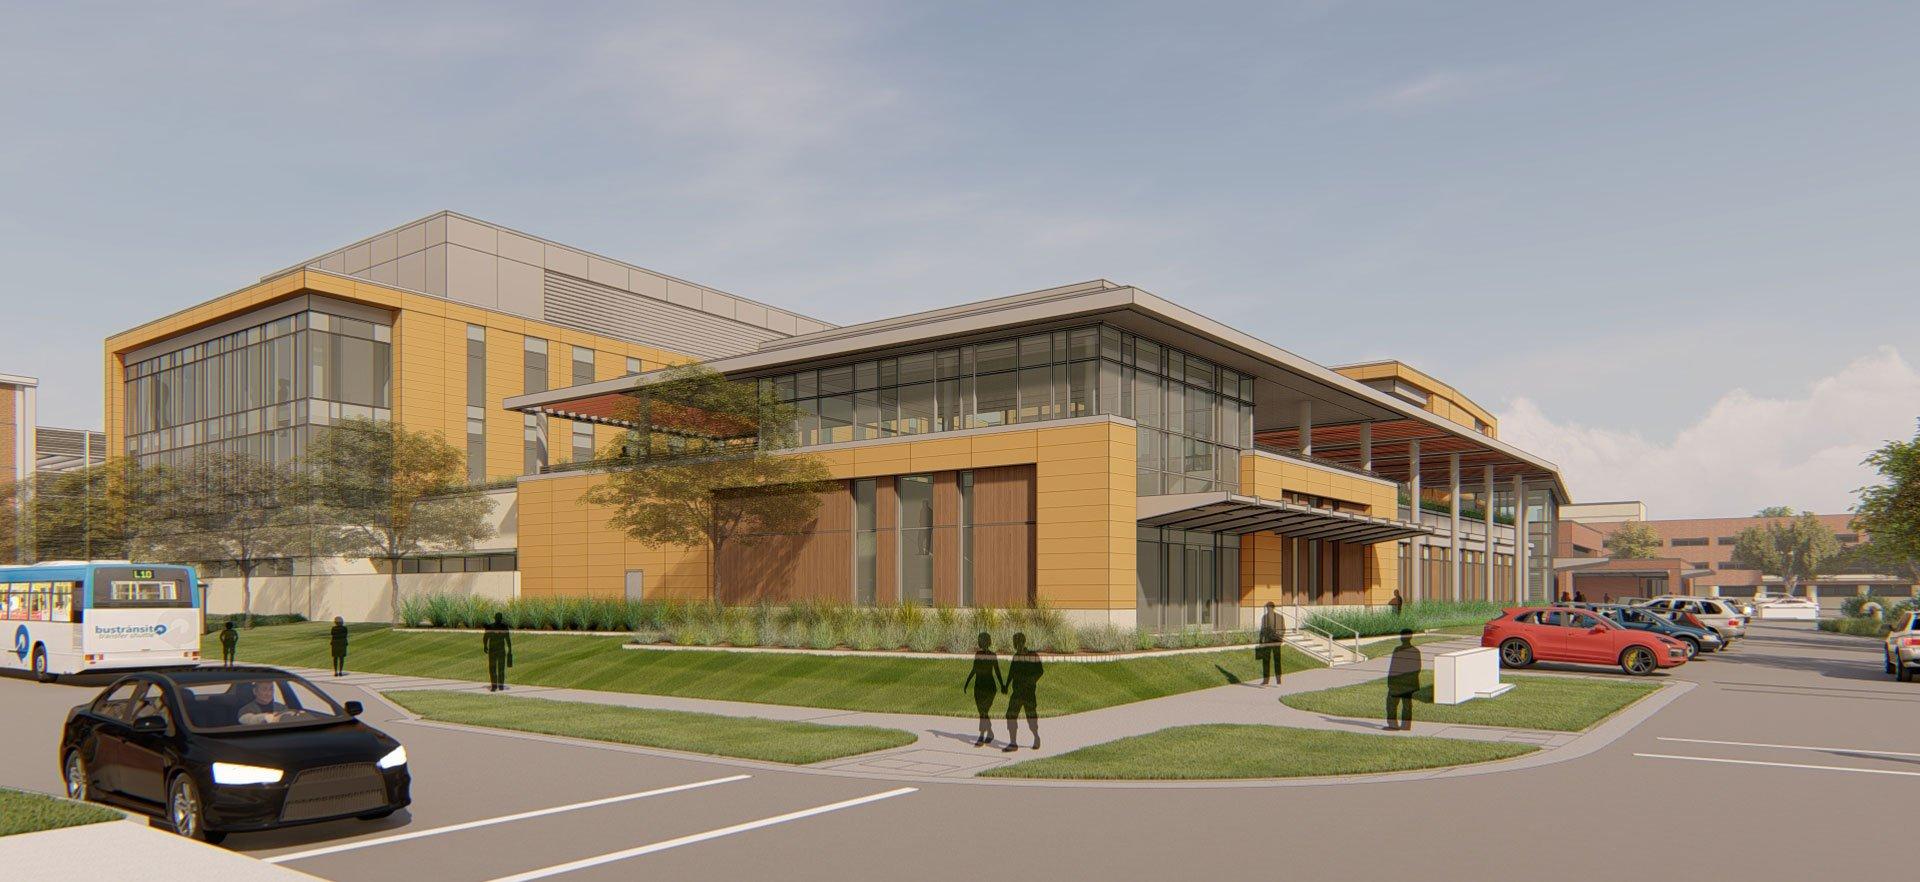 UW-Madison Veterinary Medicine education C.D. Smith Construction general contractor building addition renovation project